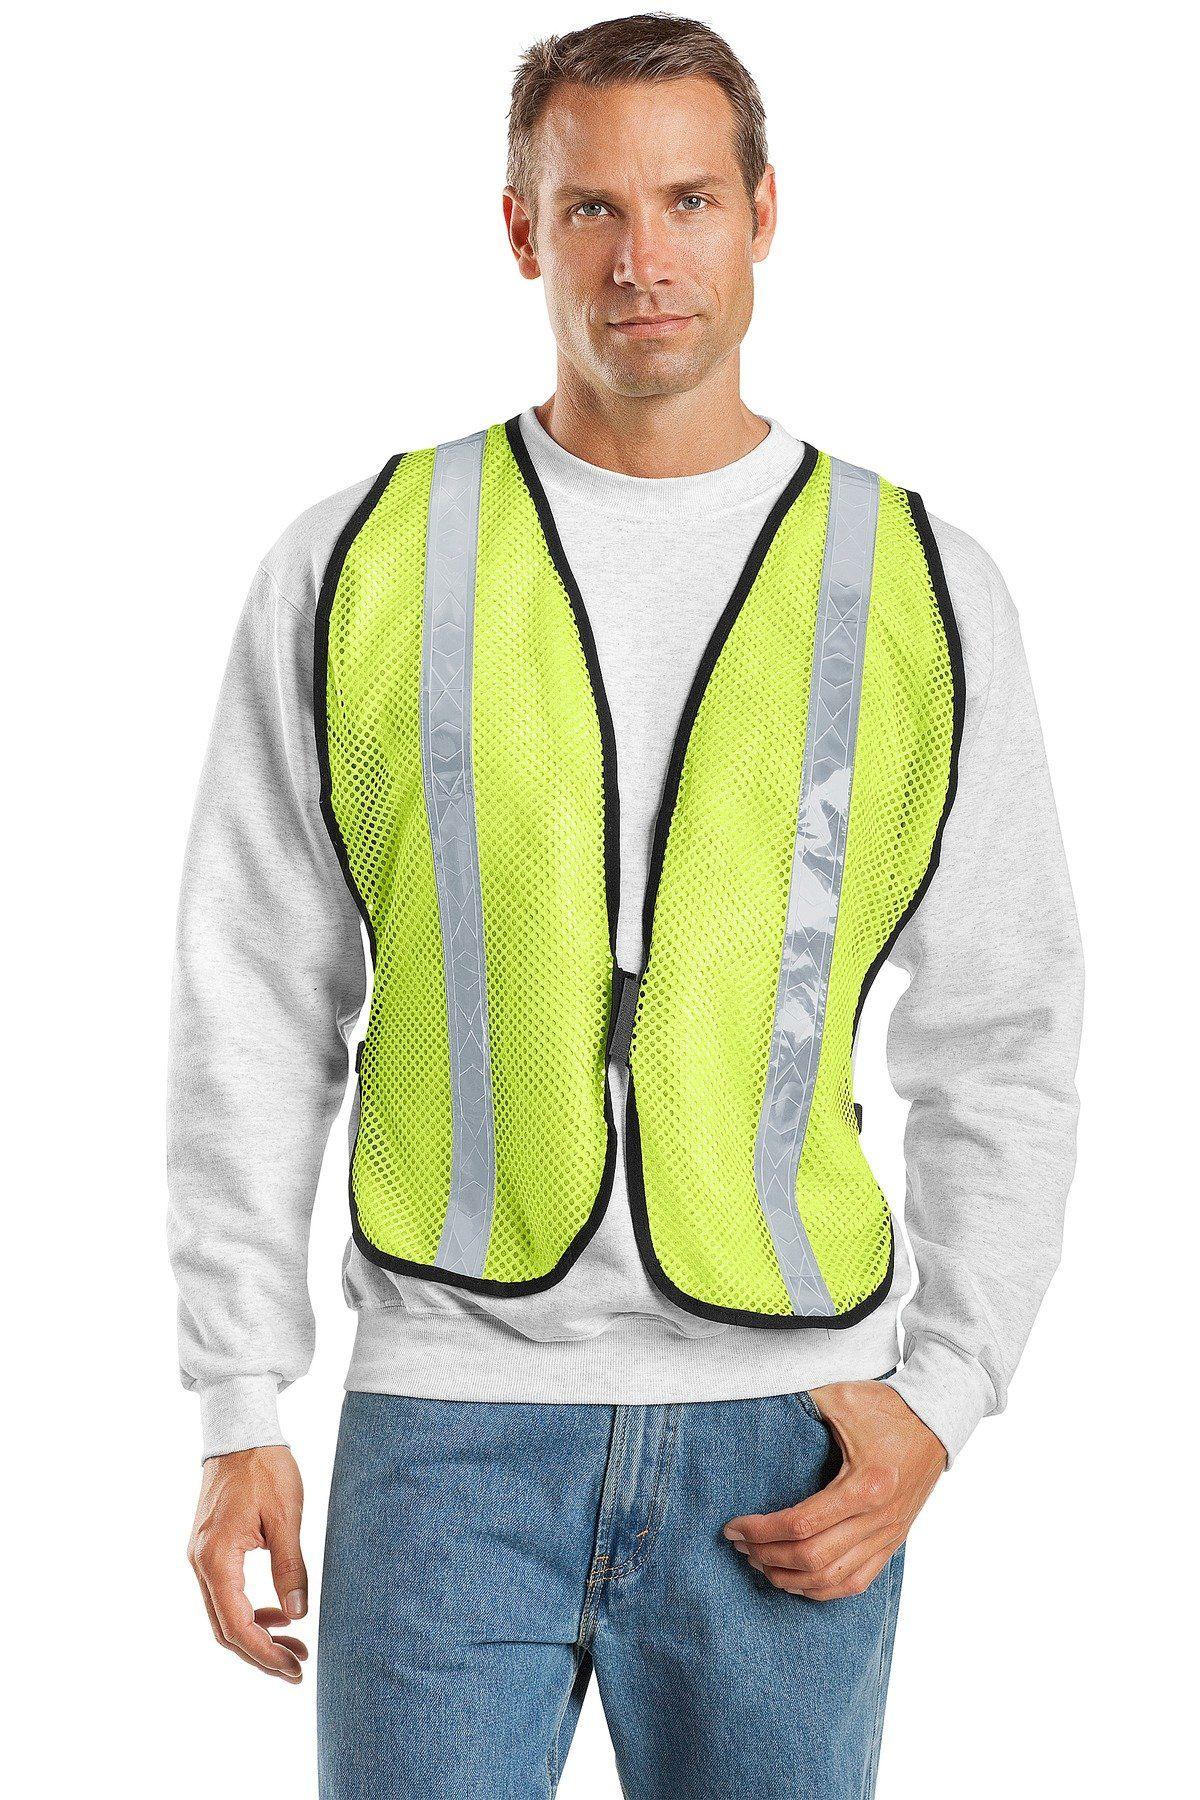 Port Authority Mesh Enhanced Visibility Vest SV02 Safety